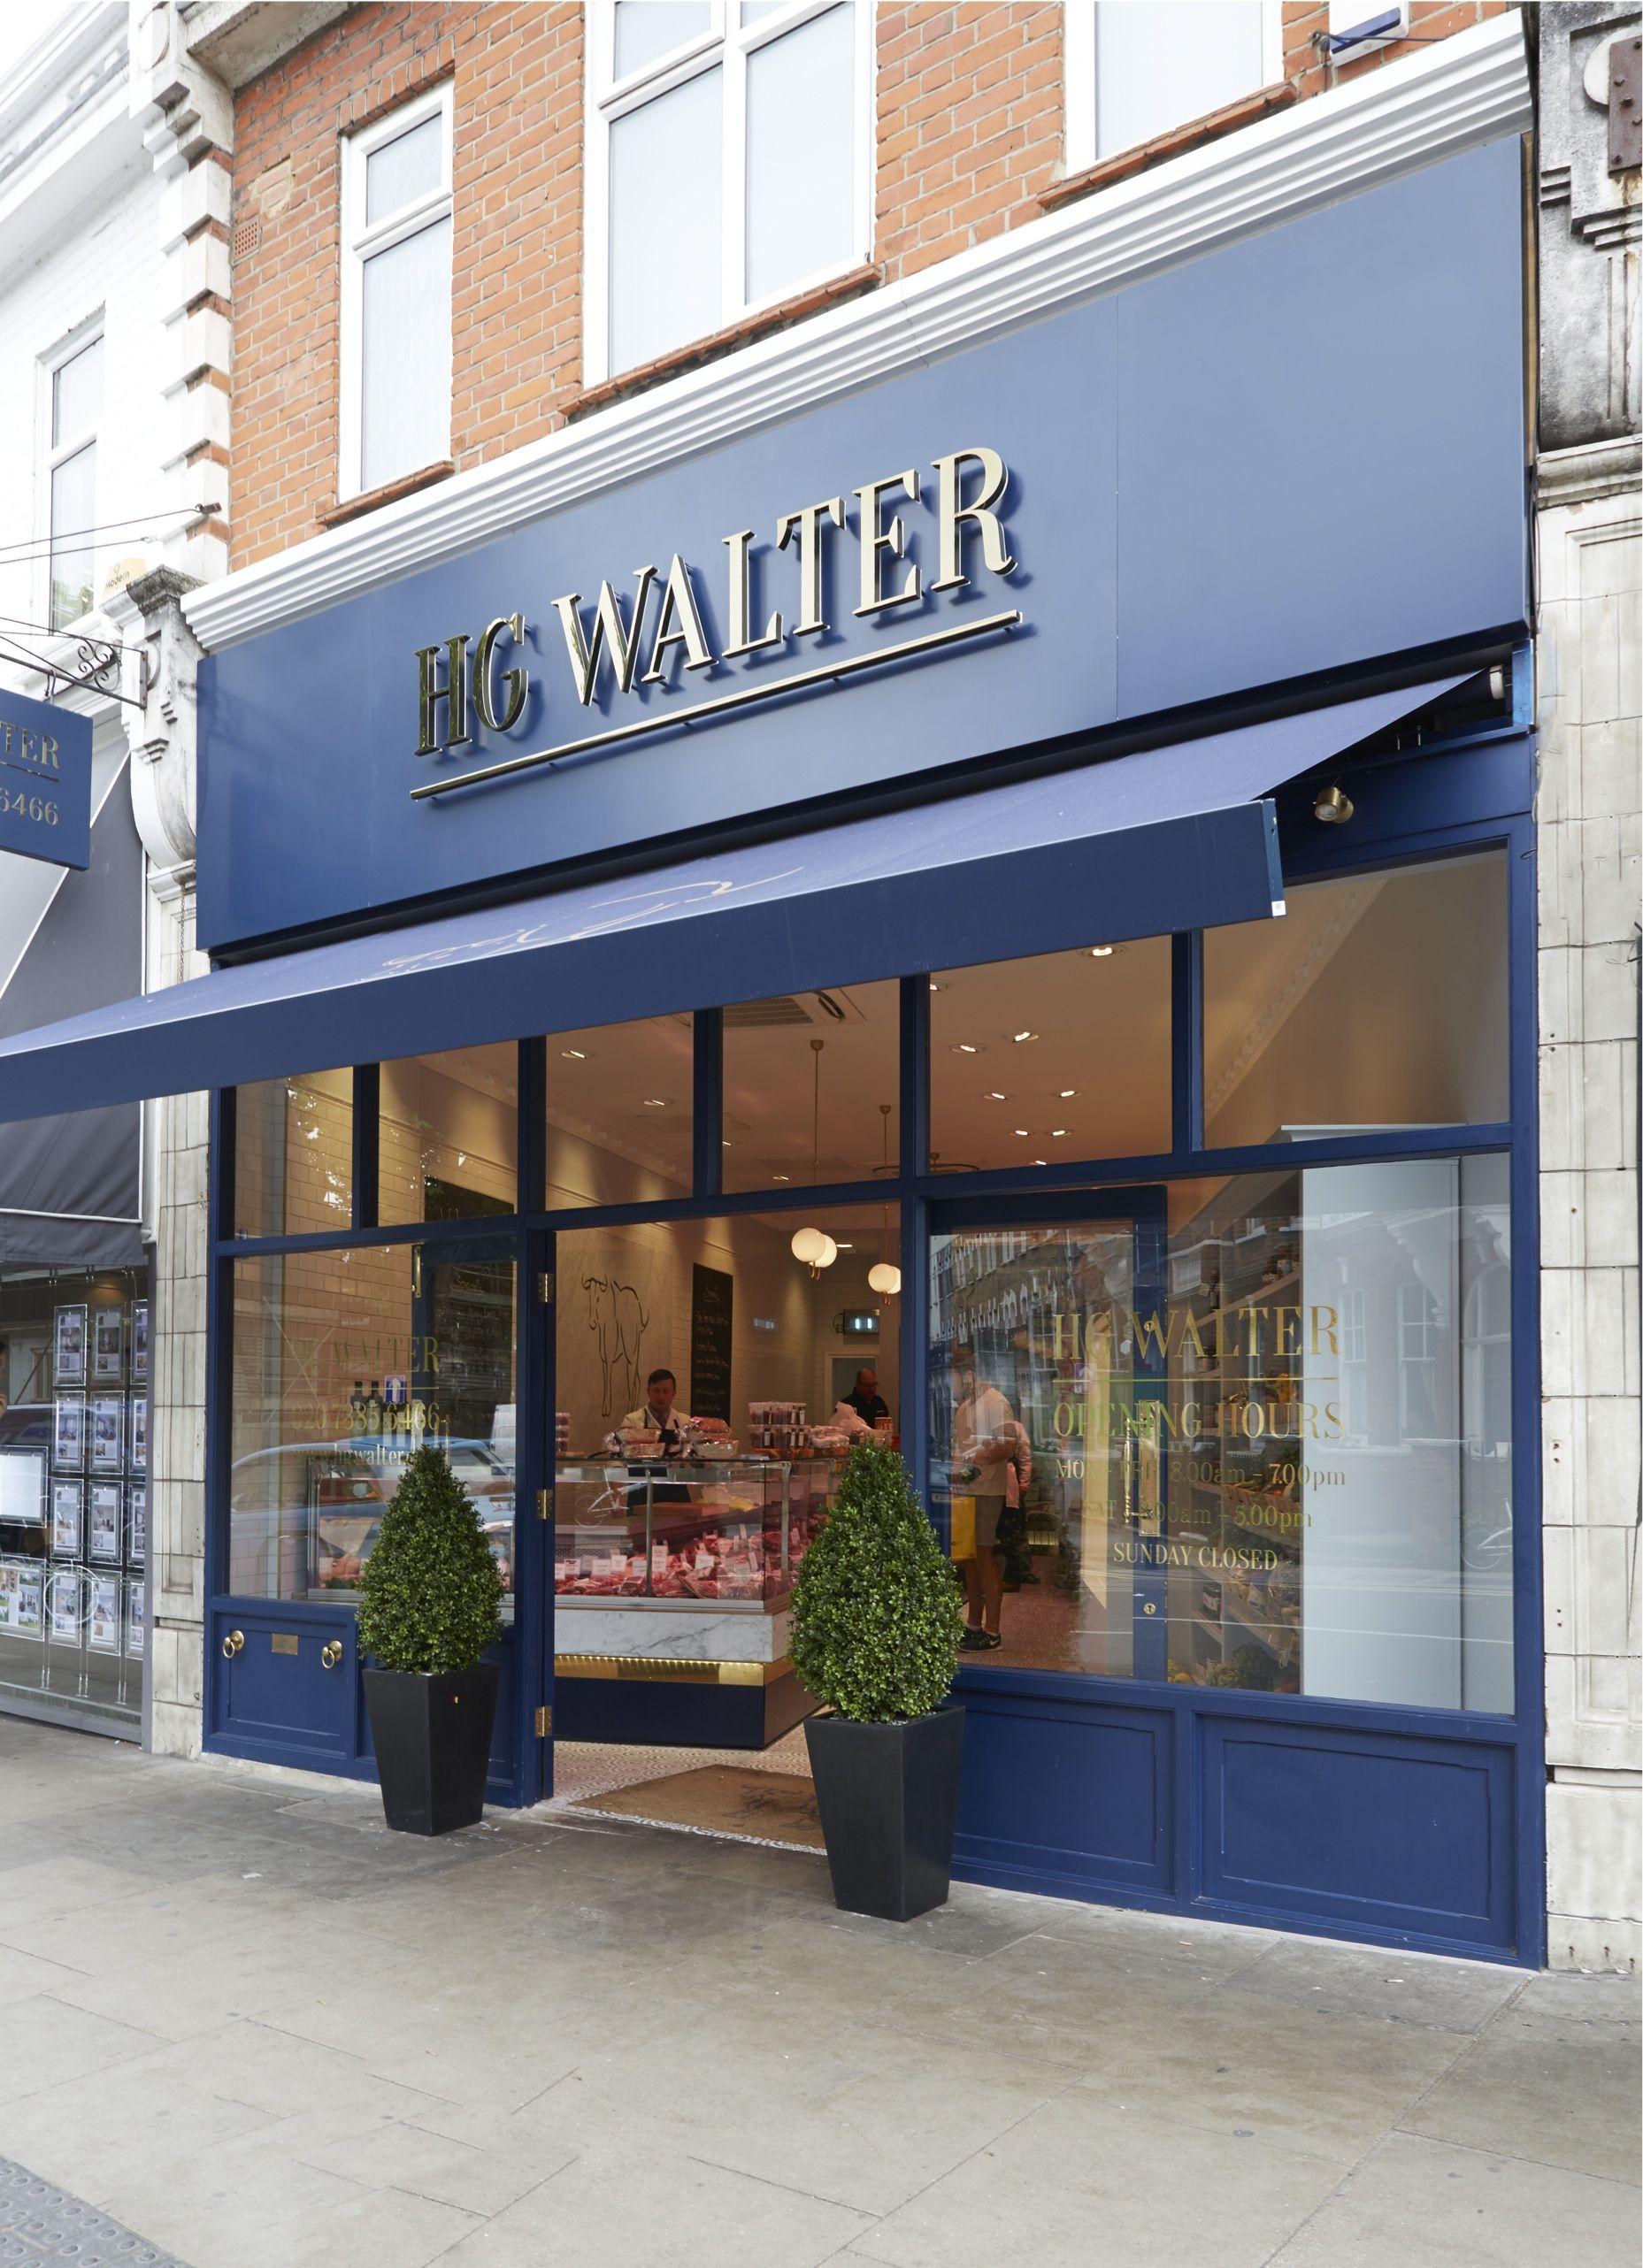 Walter Ltd fachada do açougue hg walter em londres hg walter butcher design